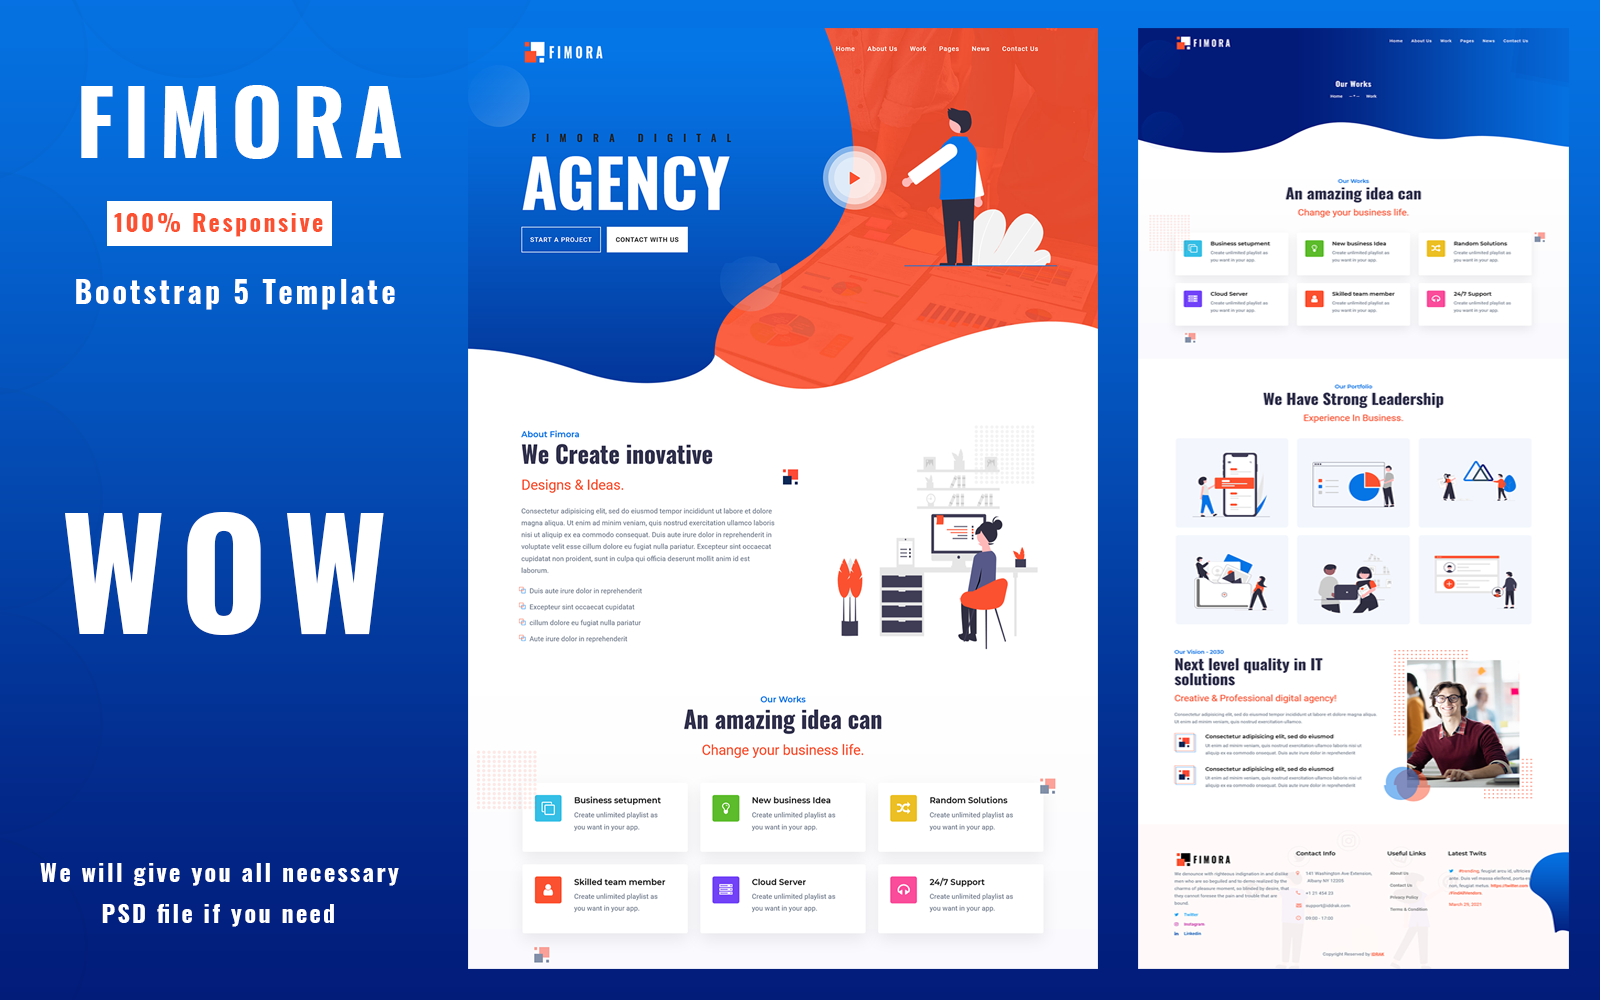 Fimora - Digital Agency Business Website Template